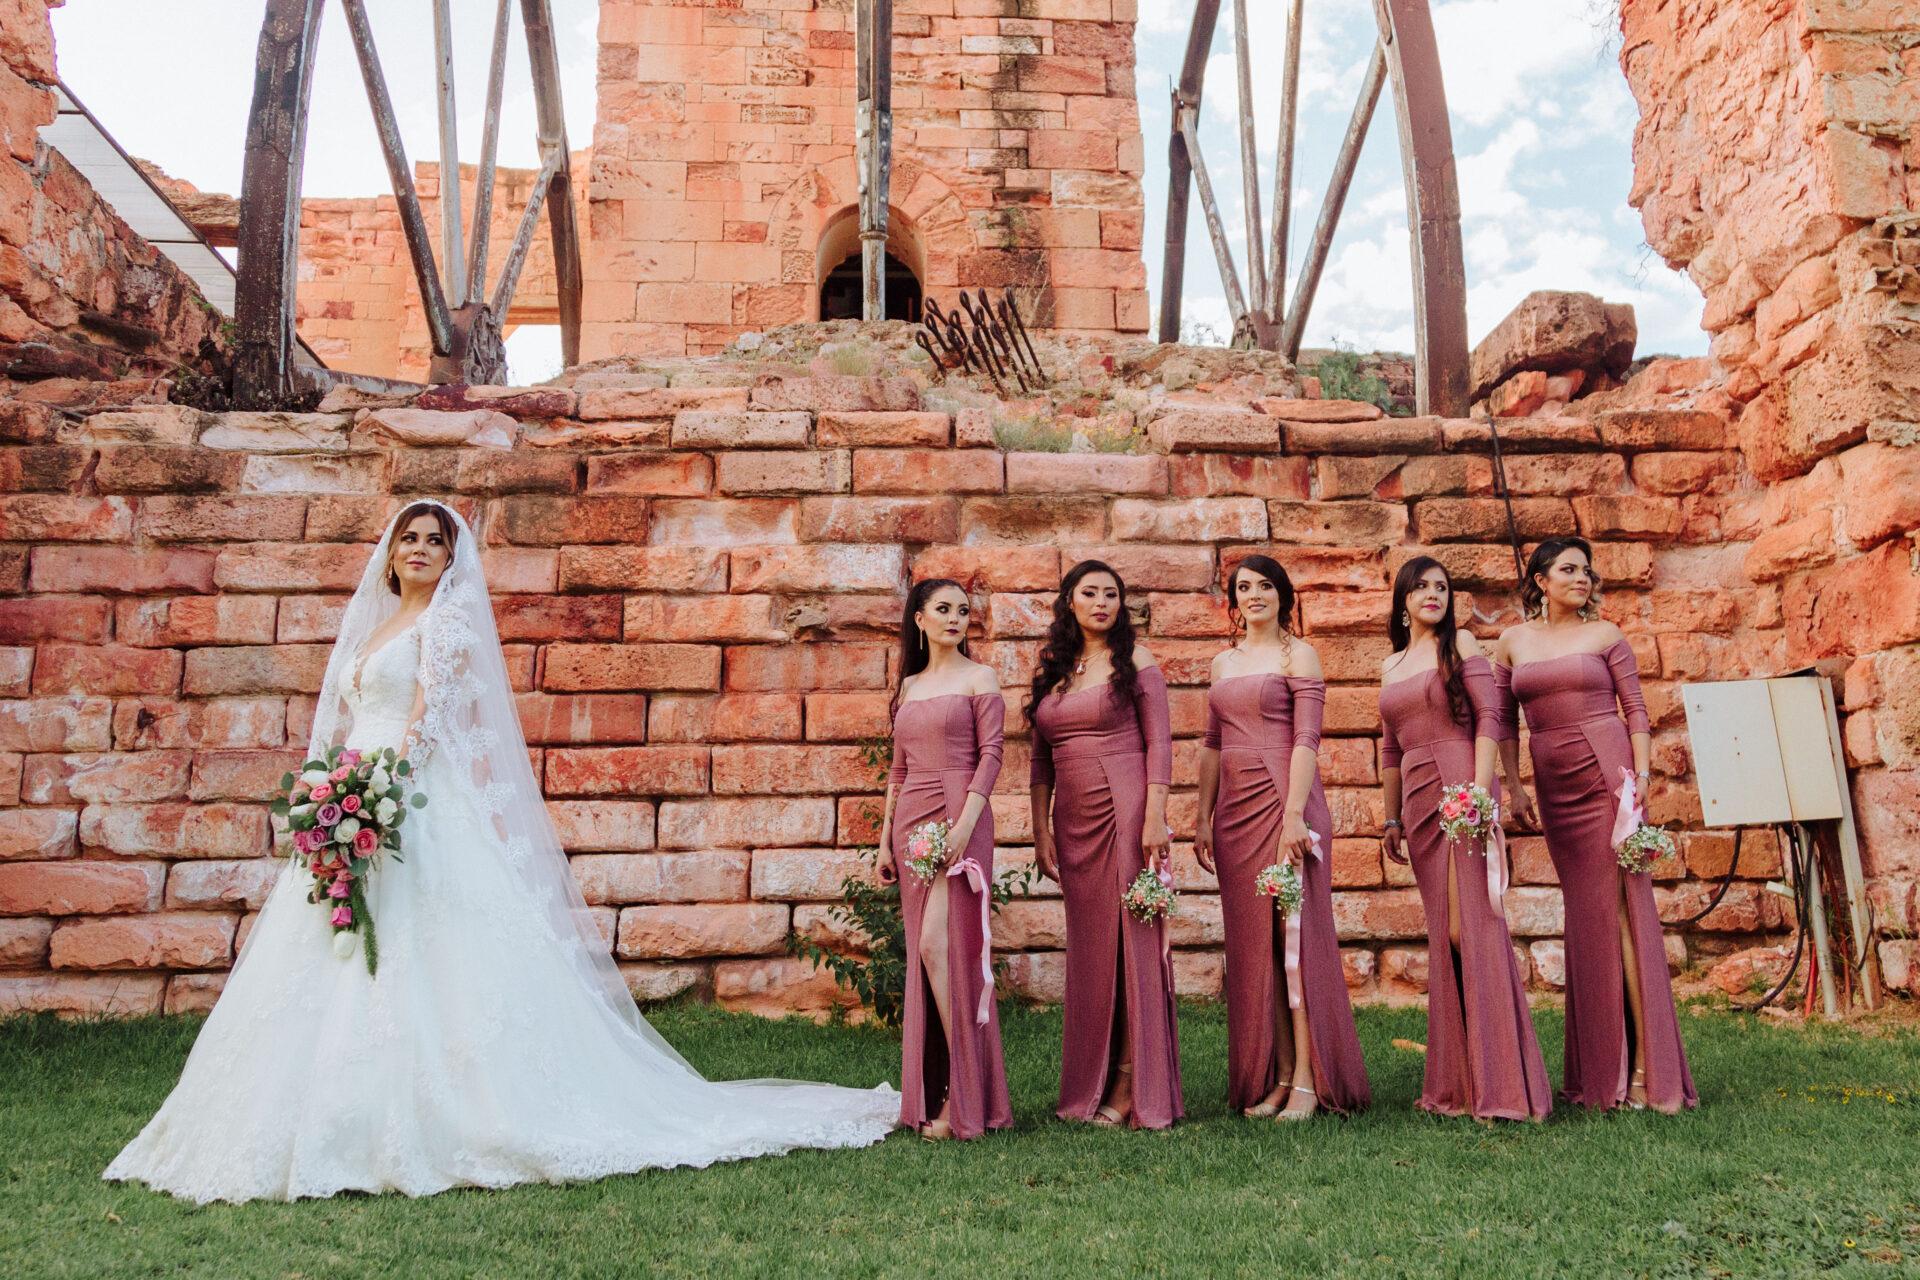 javier_noriega_fotografo_bodas_zacatecas_fresnillo_chihuahua_wedding_photographer16